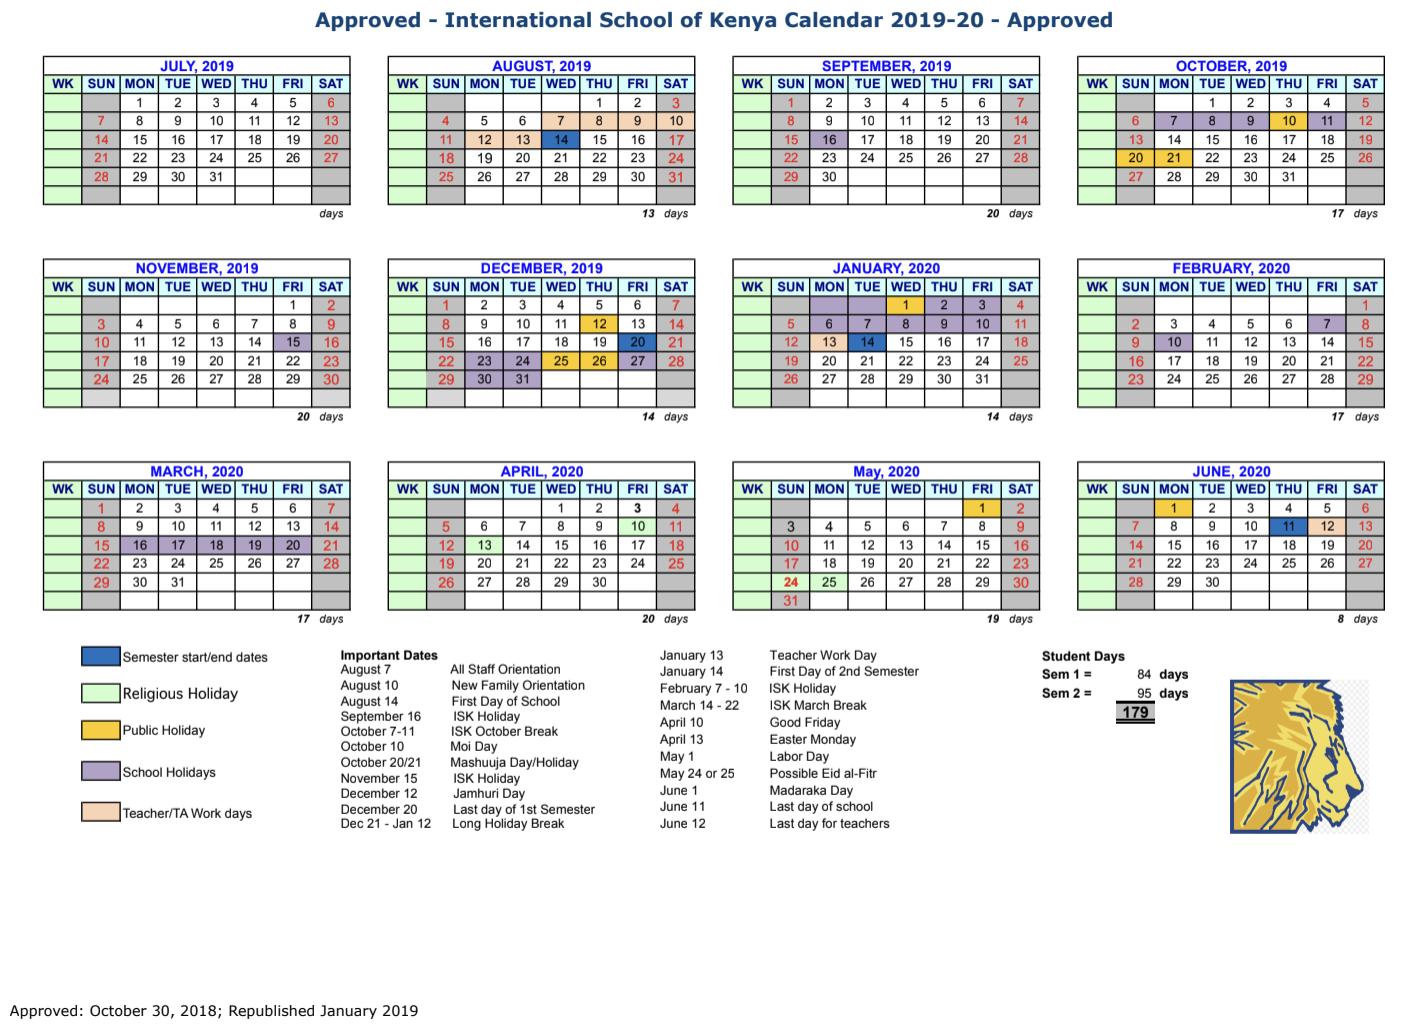 Social Security Payment Calendar 2020.School Calendar International School Of Kenya